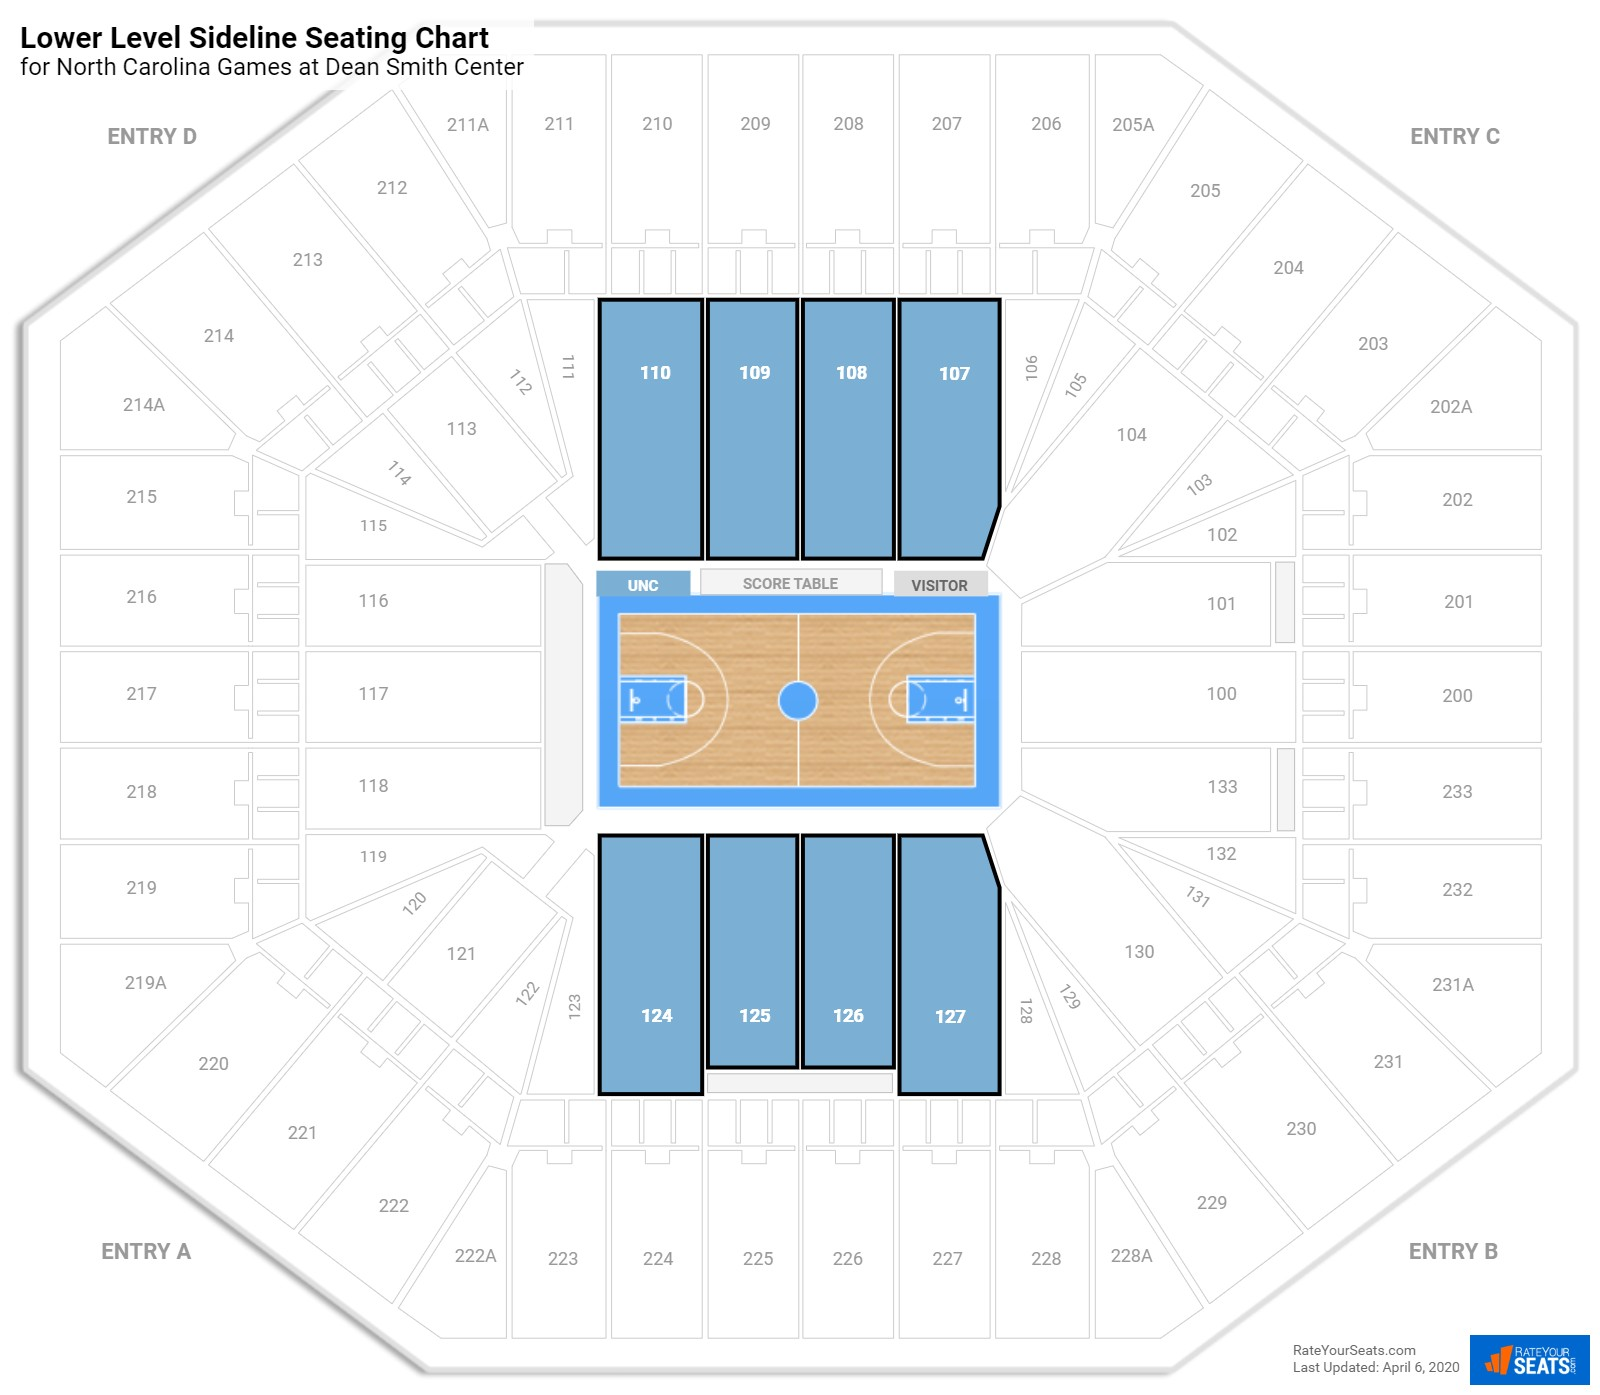 Dean Smith Center North Carolina Seating Guide